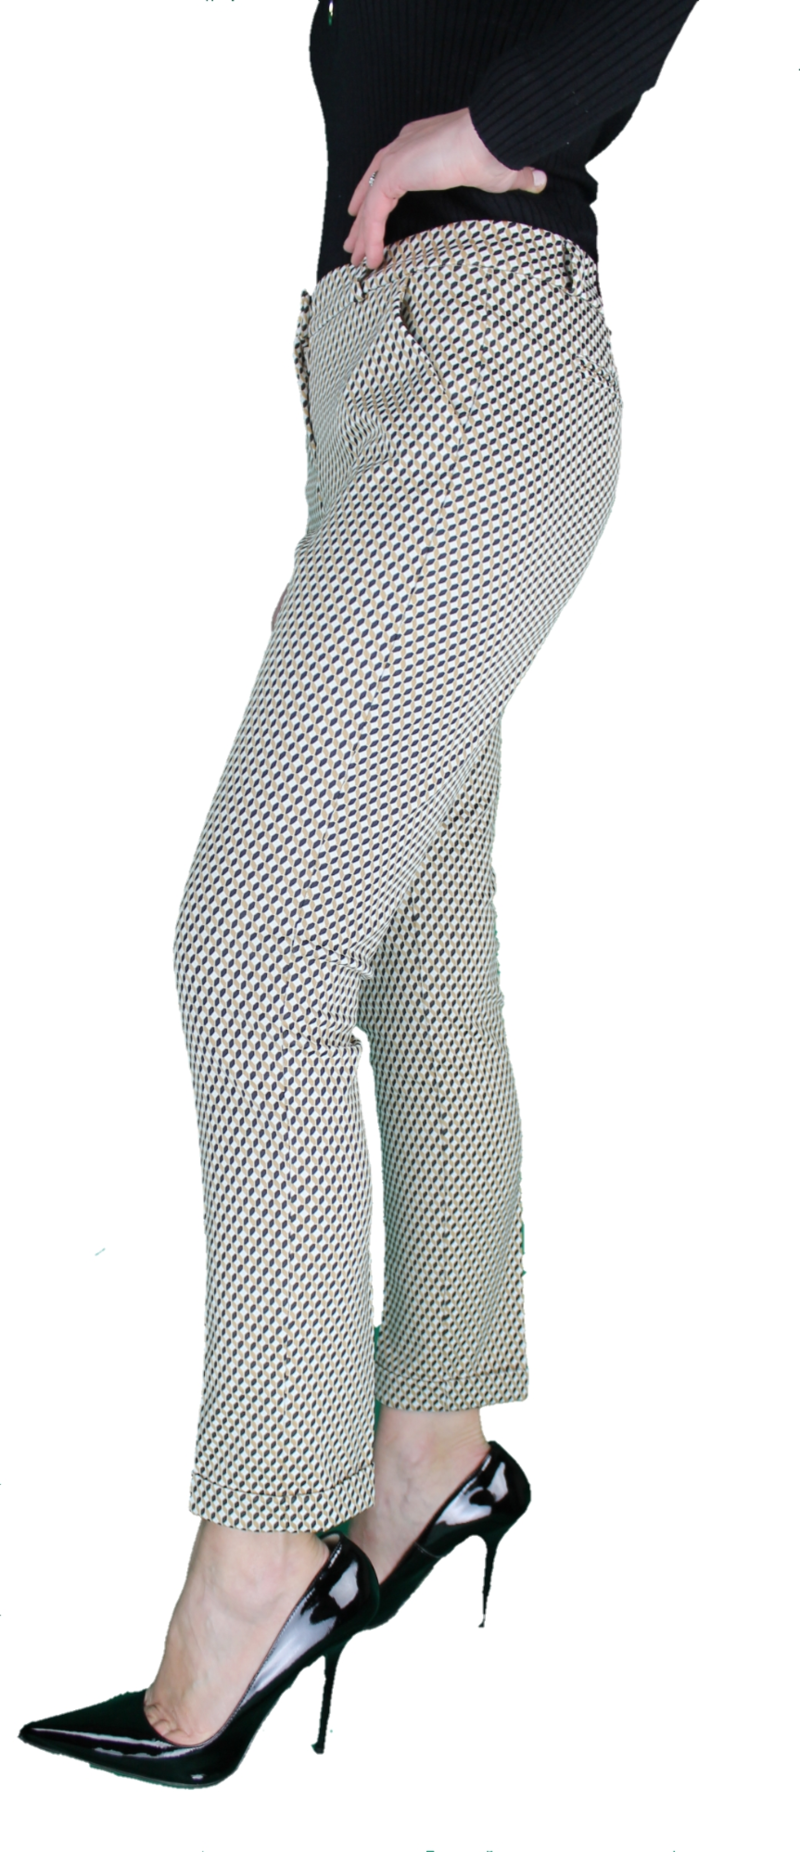 pantalone-art-641-cammello